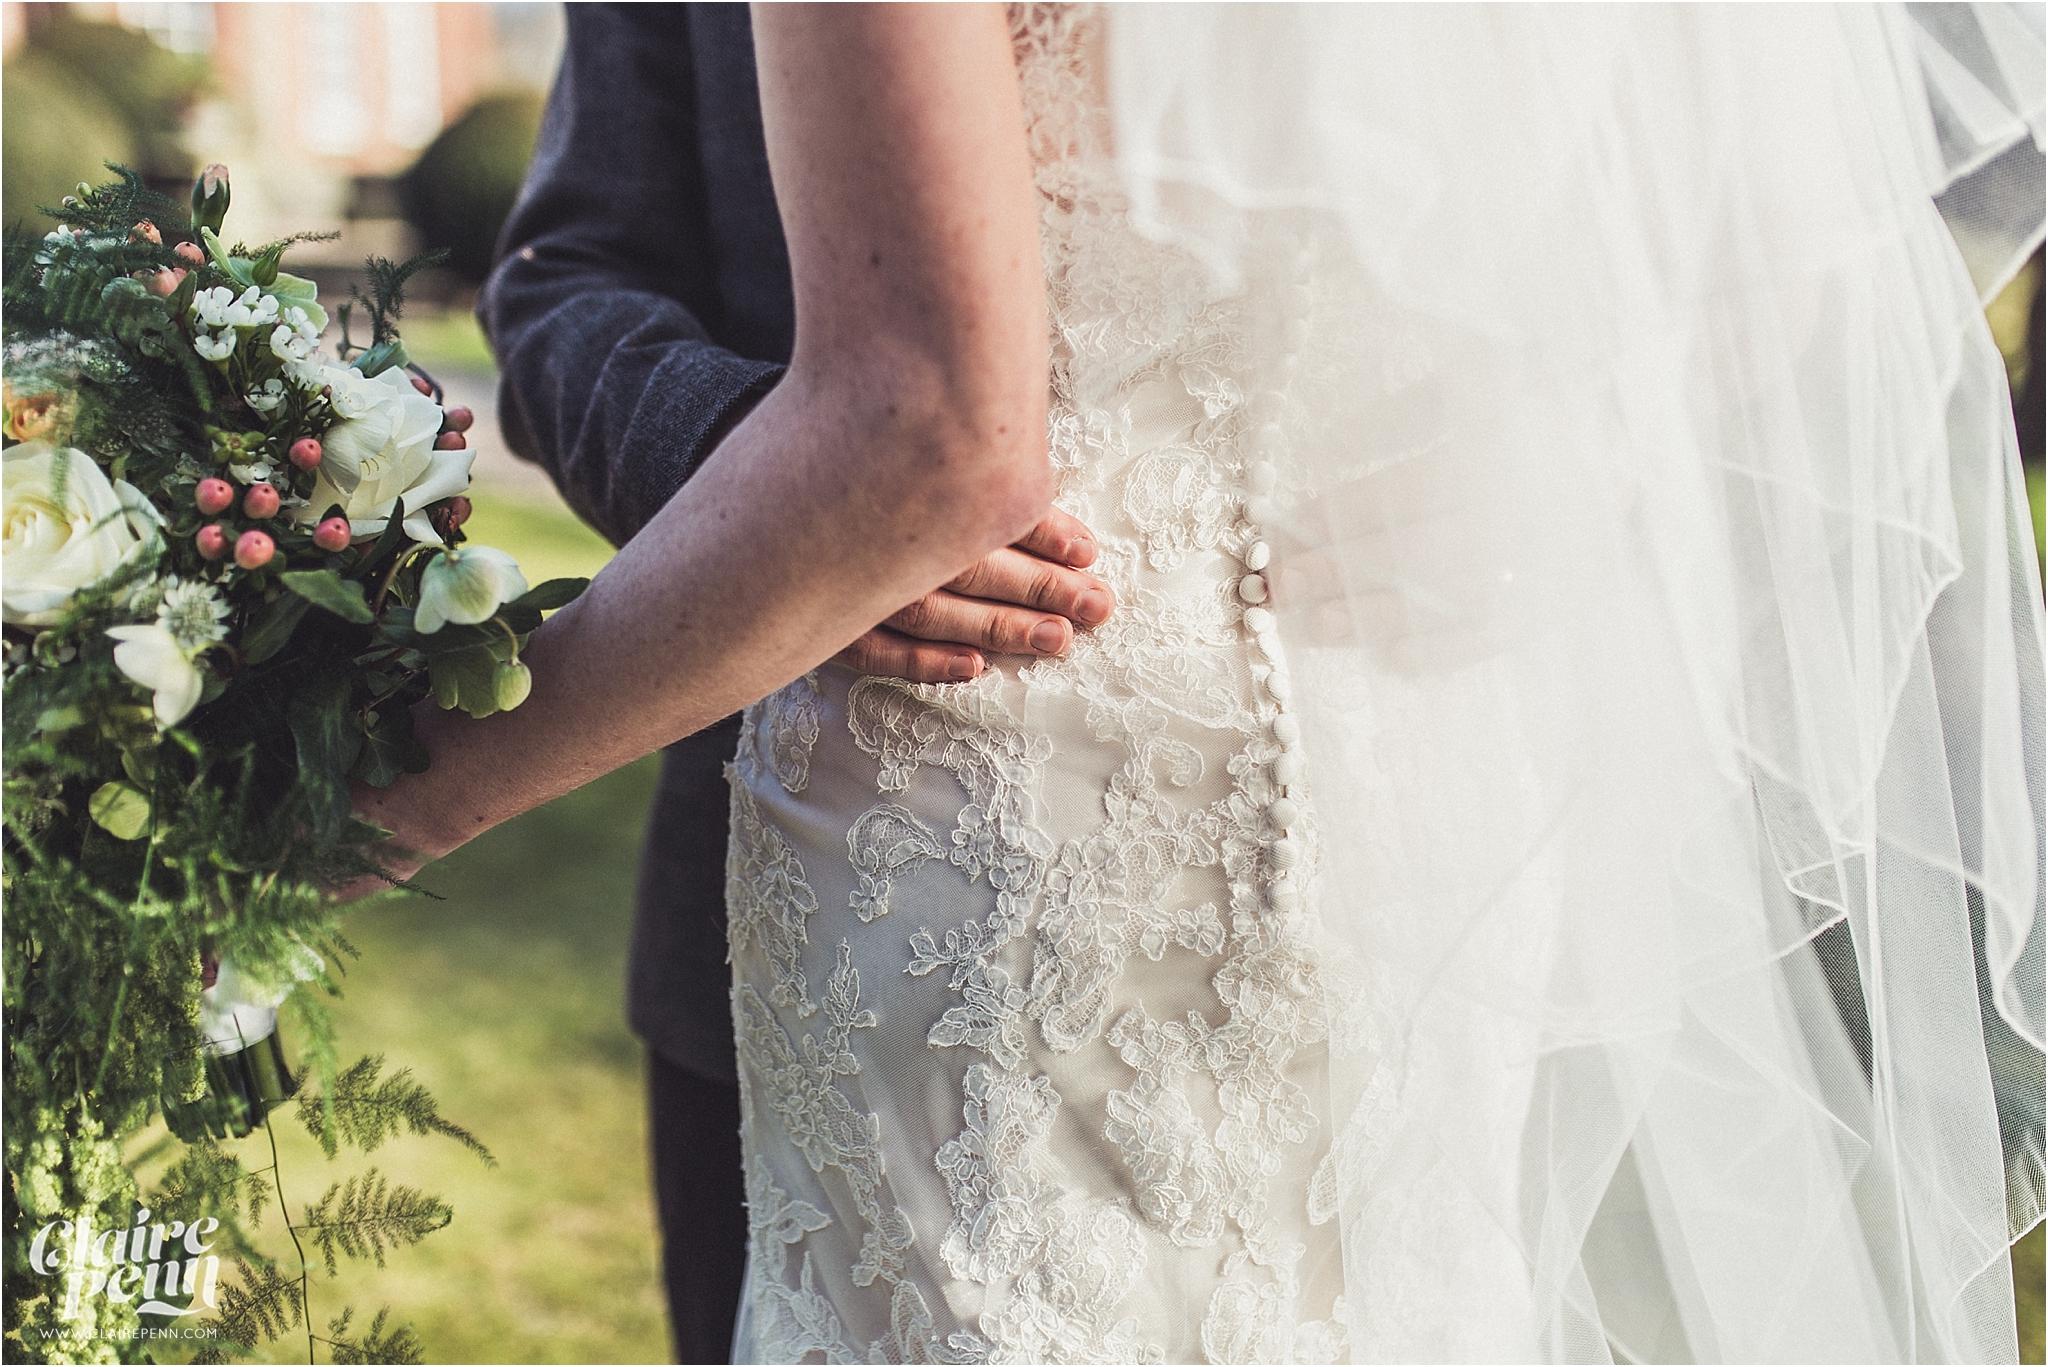 Iscoyd Park wedding, Whitchurch, Cheshire wedding photographer_0036.jpg